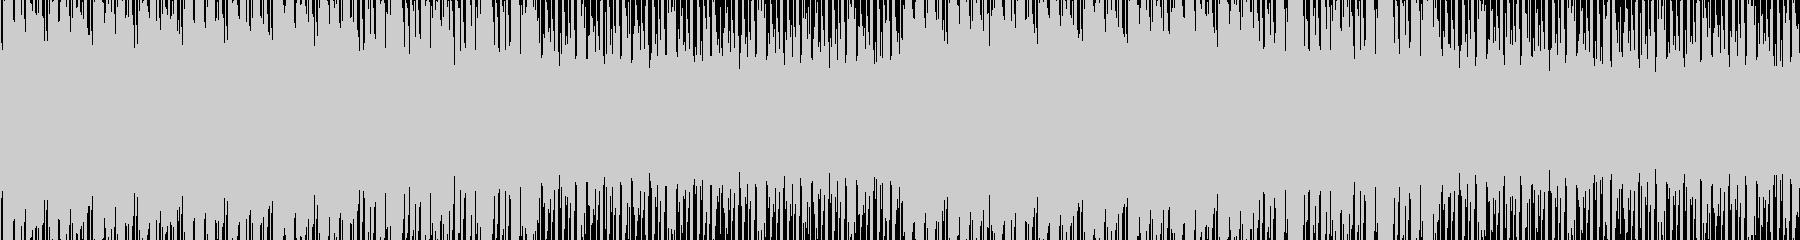 Relaxing: Everyday: Electric guitar [Loop]'s unreproduced waveform